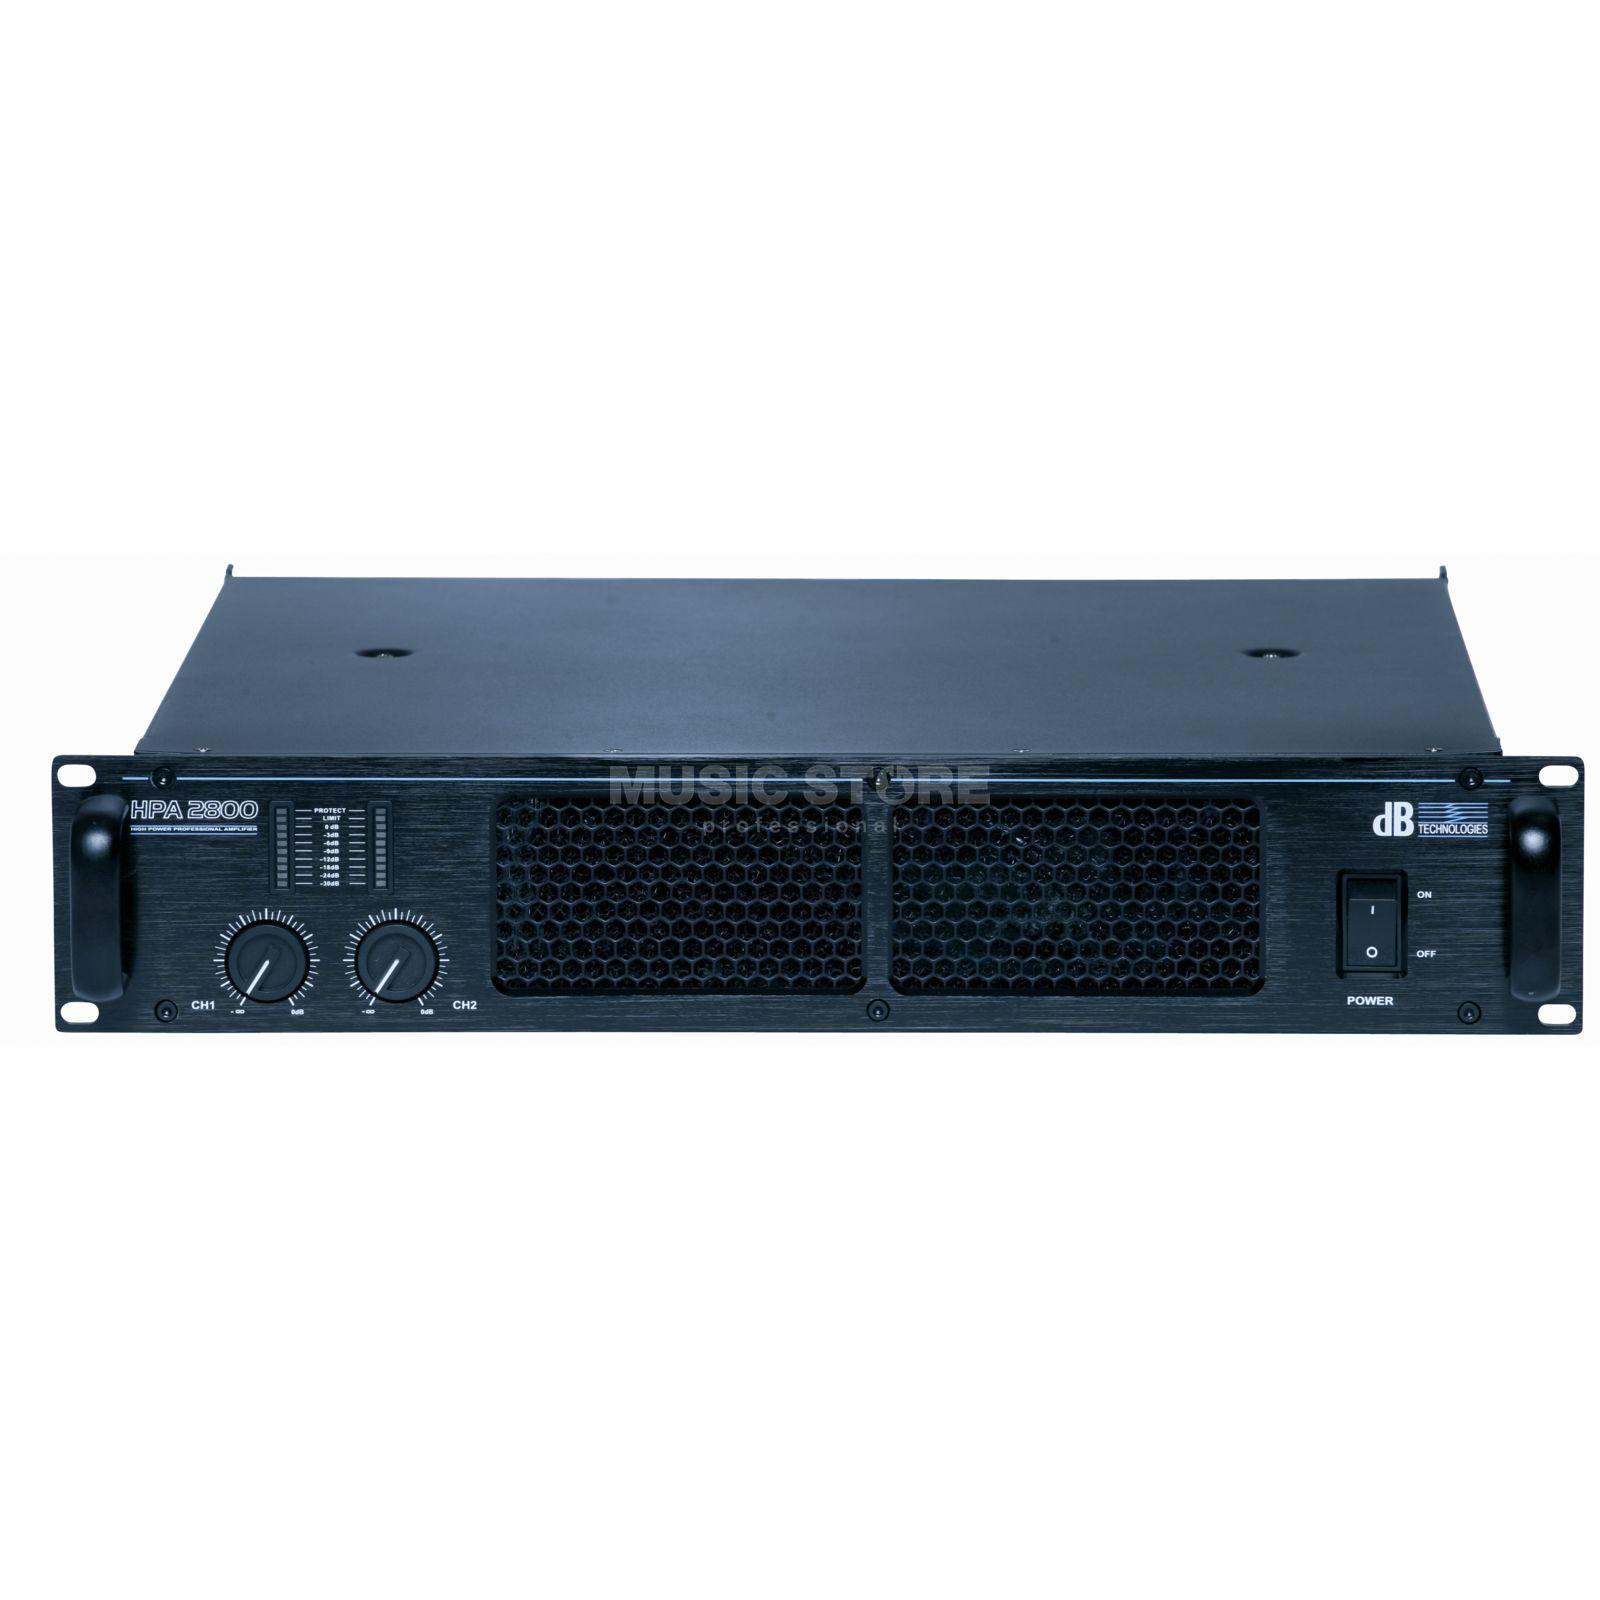 db technologies hpa 2800 ampli 2x 1050 watts 4 ohms. Black Bedroom Furniture Sets. Home Design Ideas